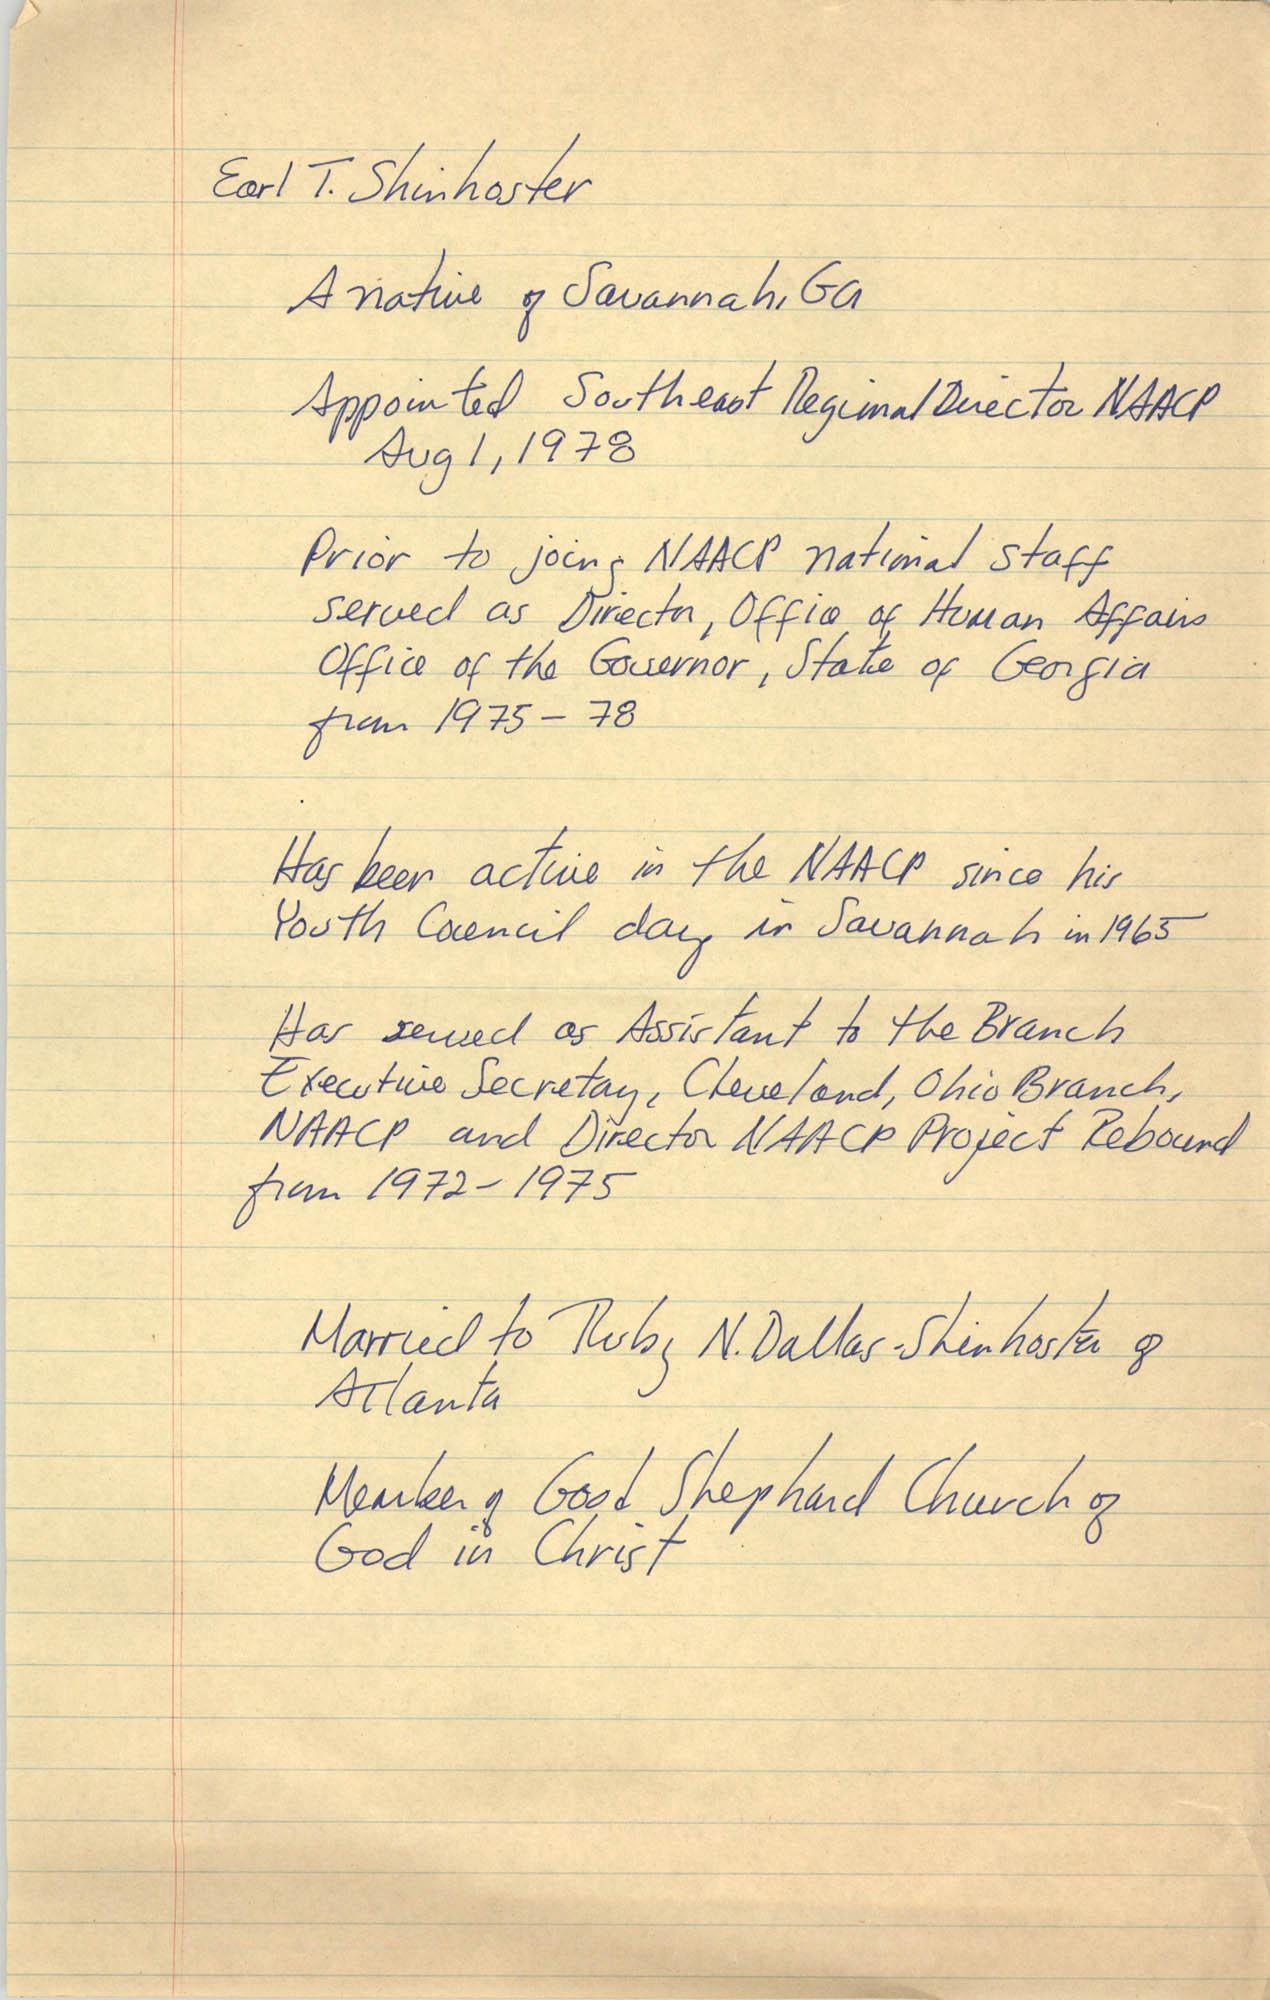 Earl T. Shinhoster Biographical Information